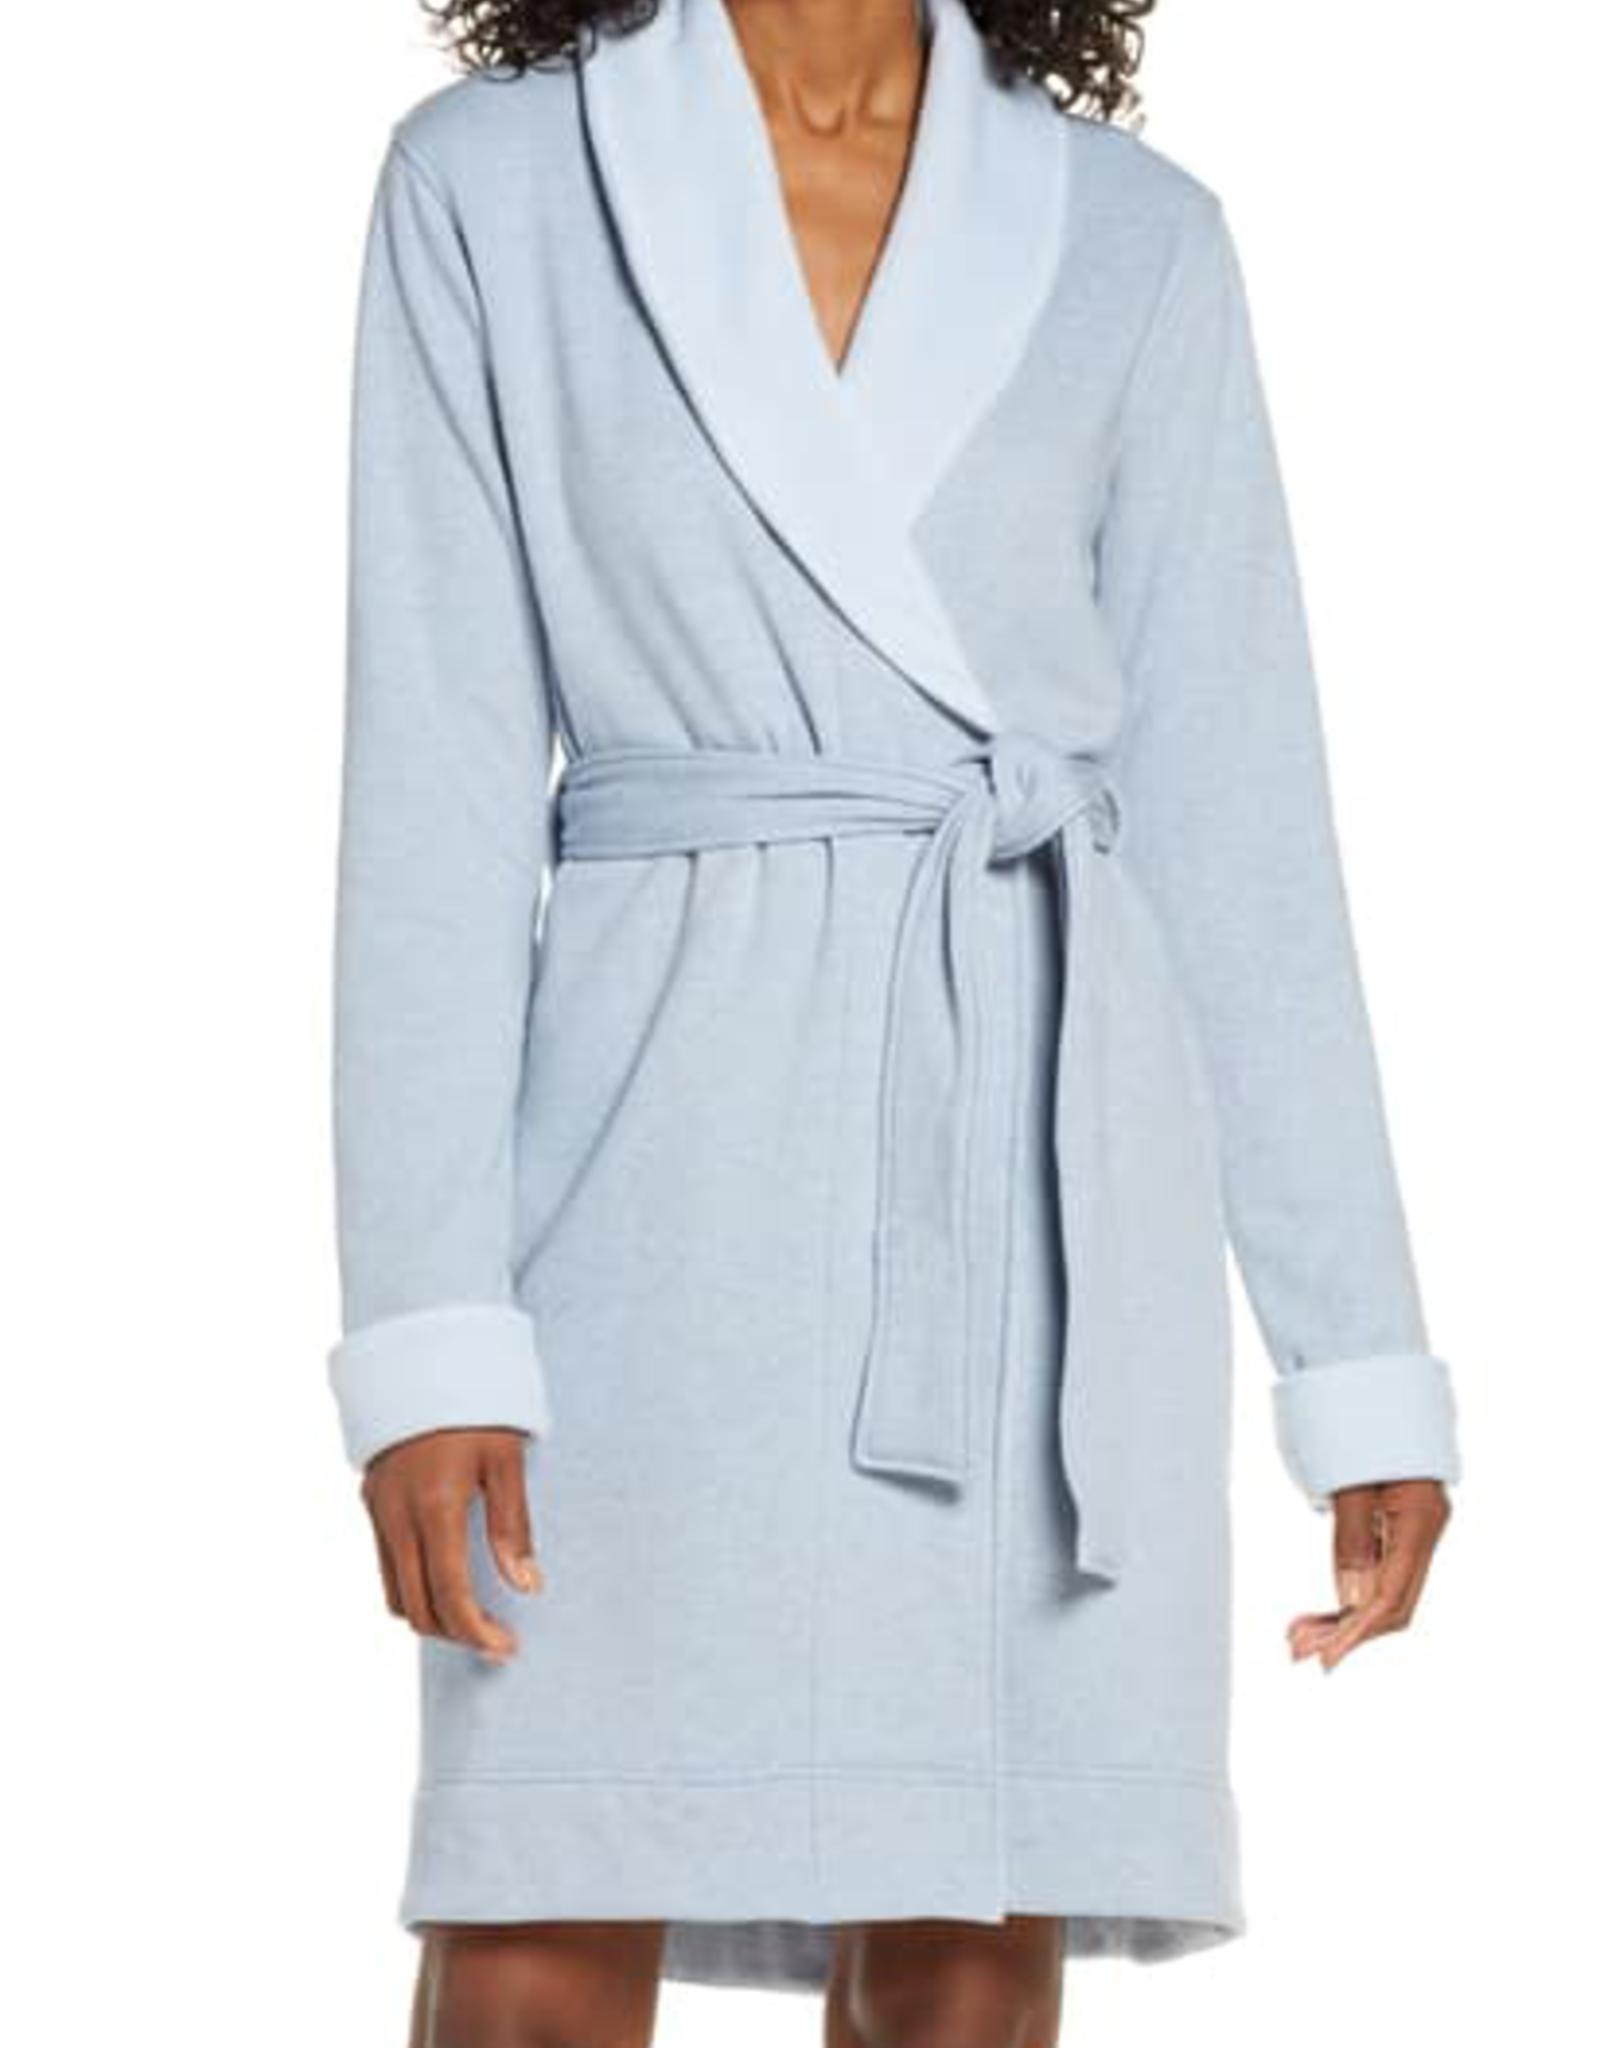 UGG UGG - Woman's Blanche Lightweight Robe